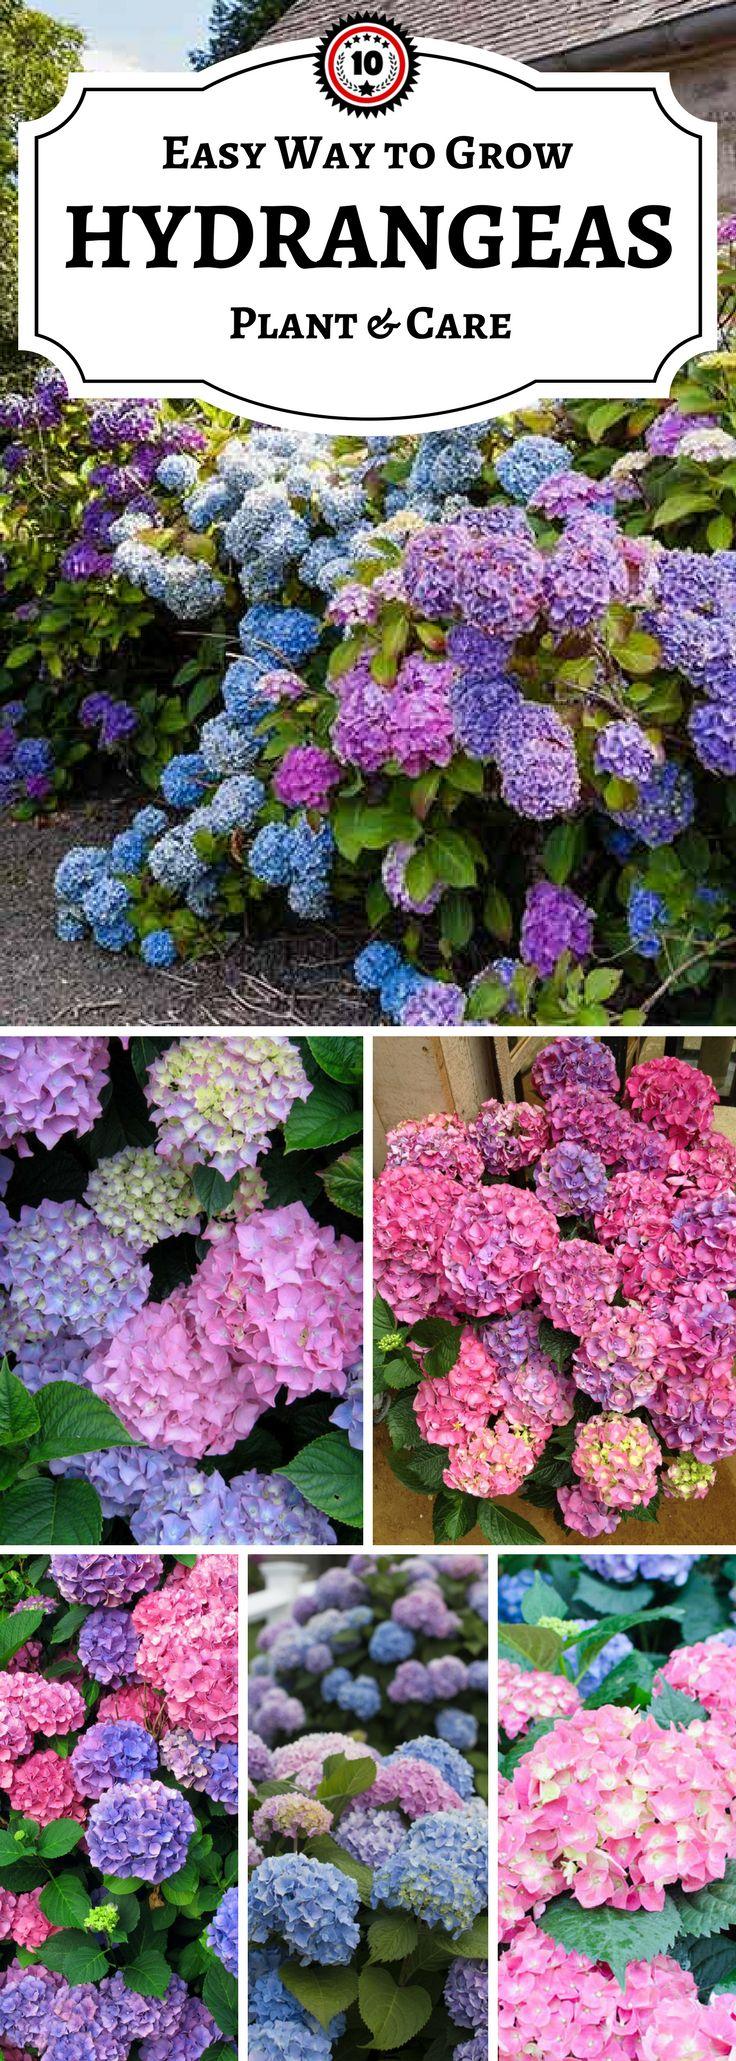 Best 25 hydrangea garden ideas on pinterest hydrangea care white hydrangea garden and hydrangea - Caring hydrangea garden ...